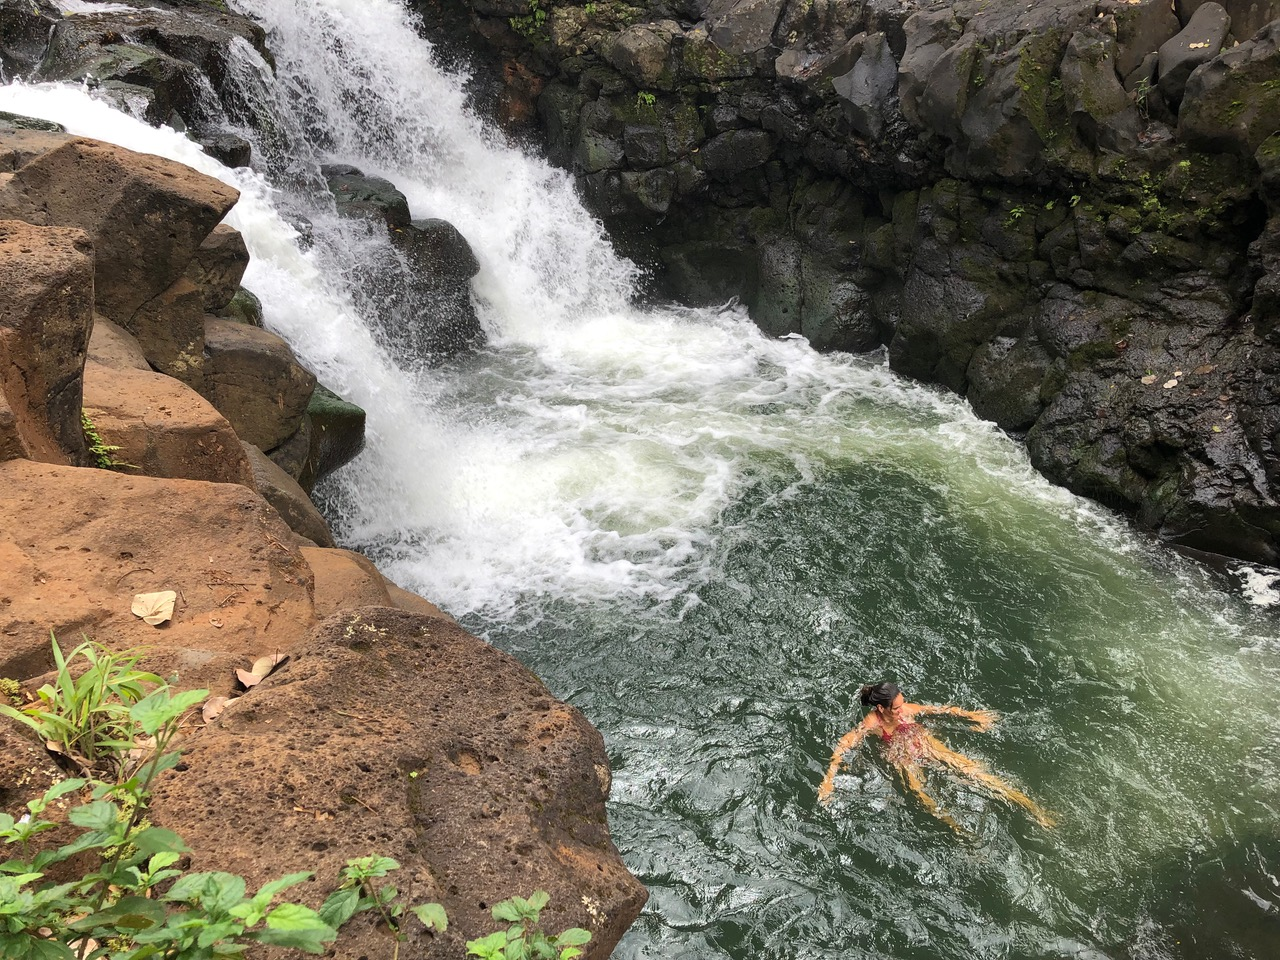 in the pool below the falls